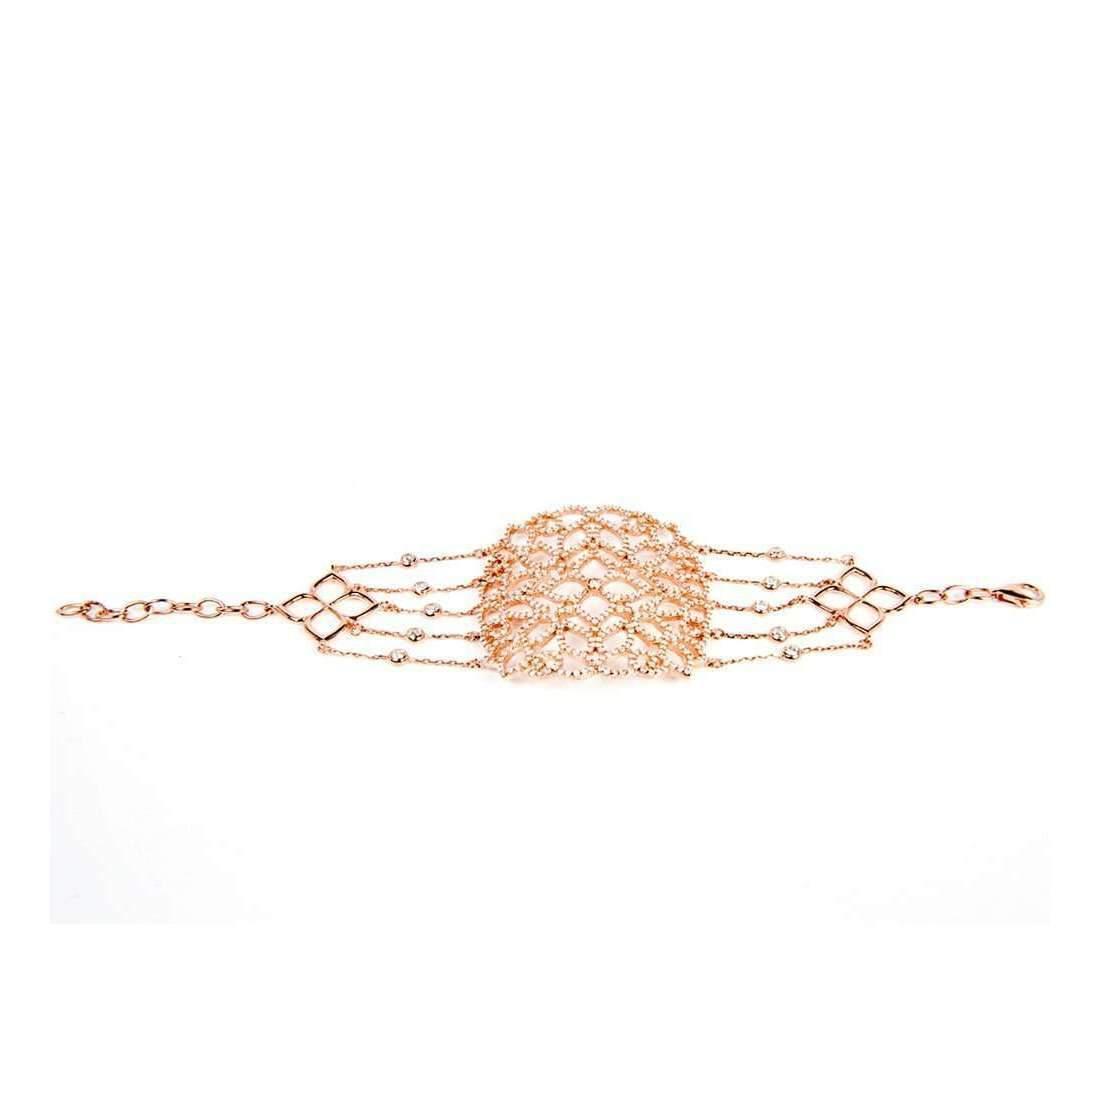 Latelita London 22kt Rose Gold Vermeil Micro pave Filigree Bracelet TwwQaXZ